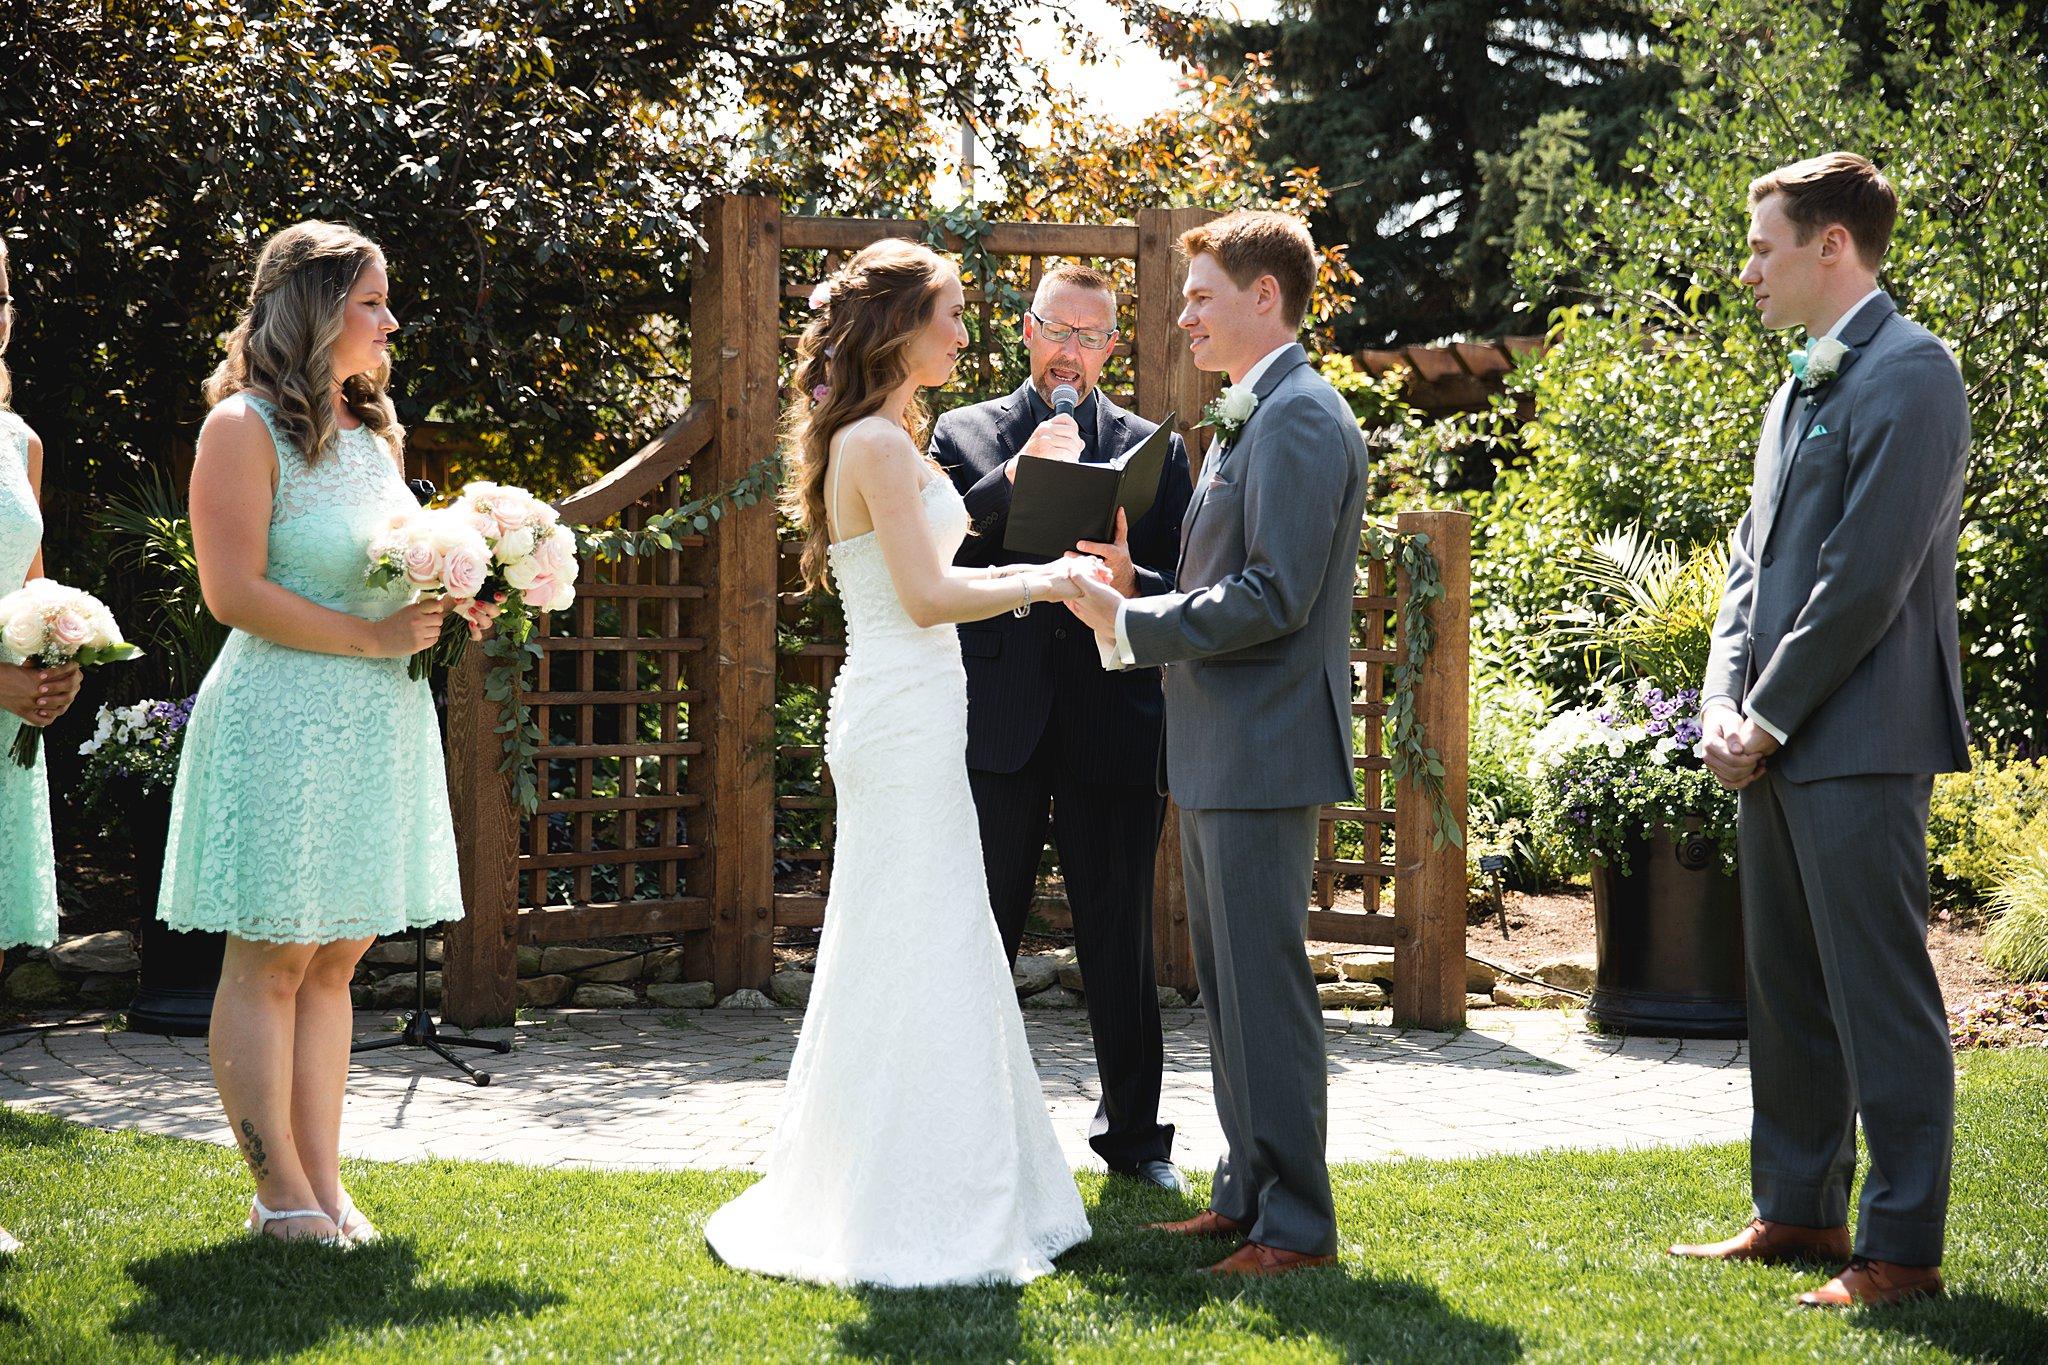 Ashley Daphne Photography Calgary Wedding Couple Family Photographer Calgary Zoo Summer Wedding Outdoor Ceremony_0071.jpg